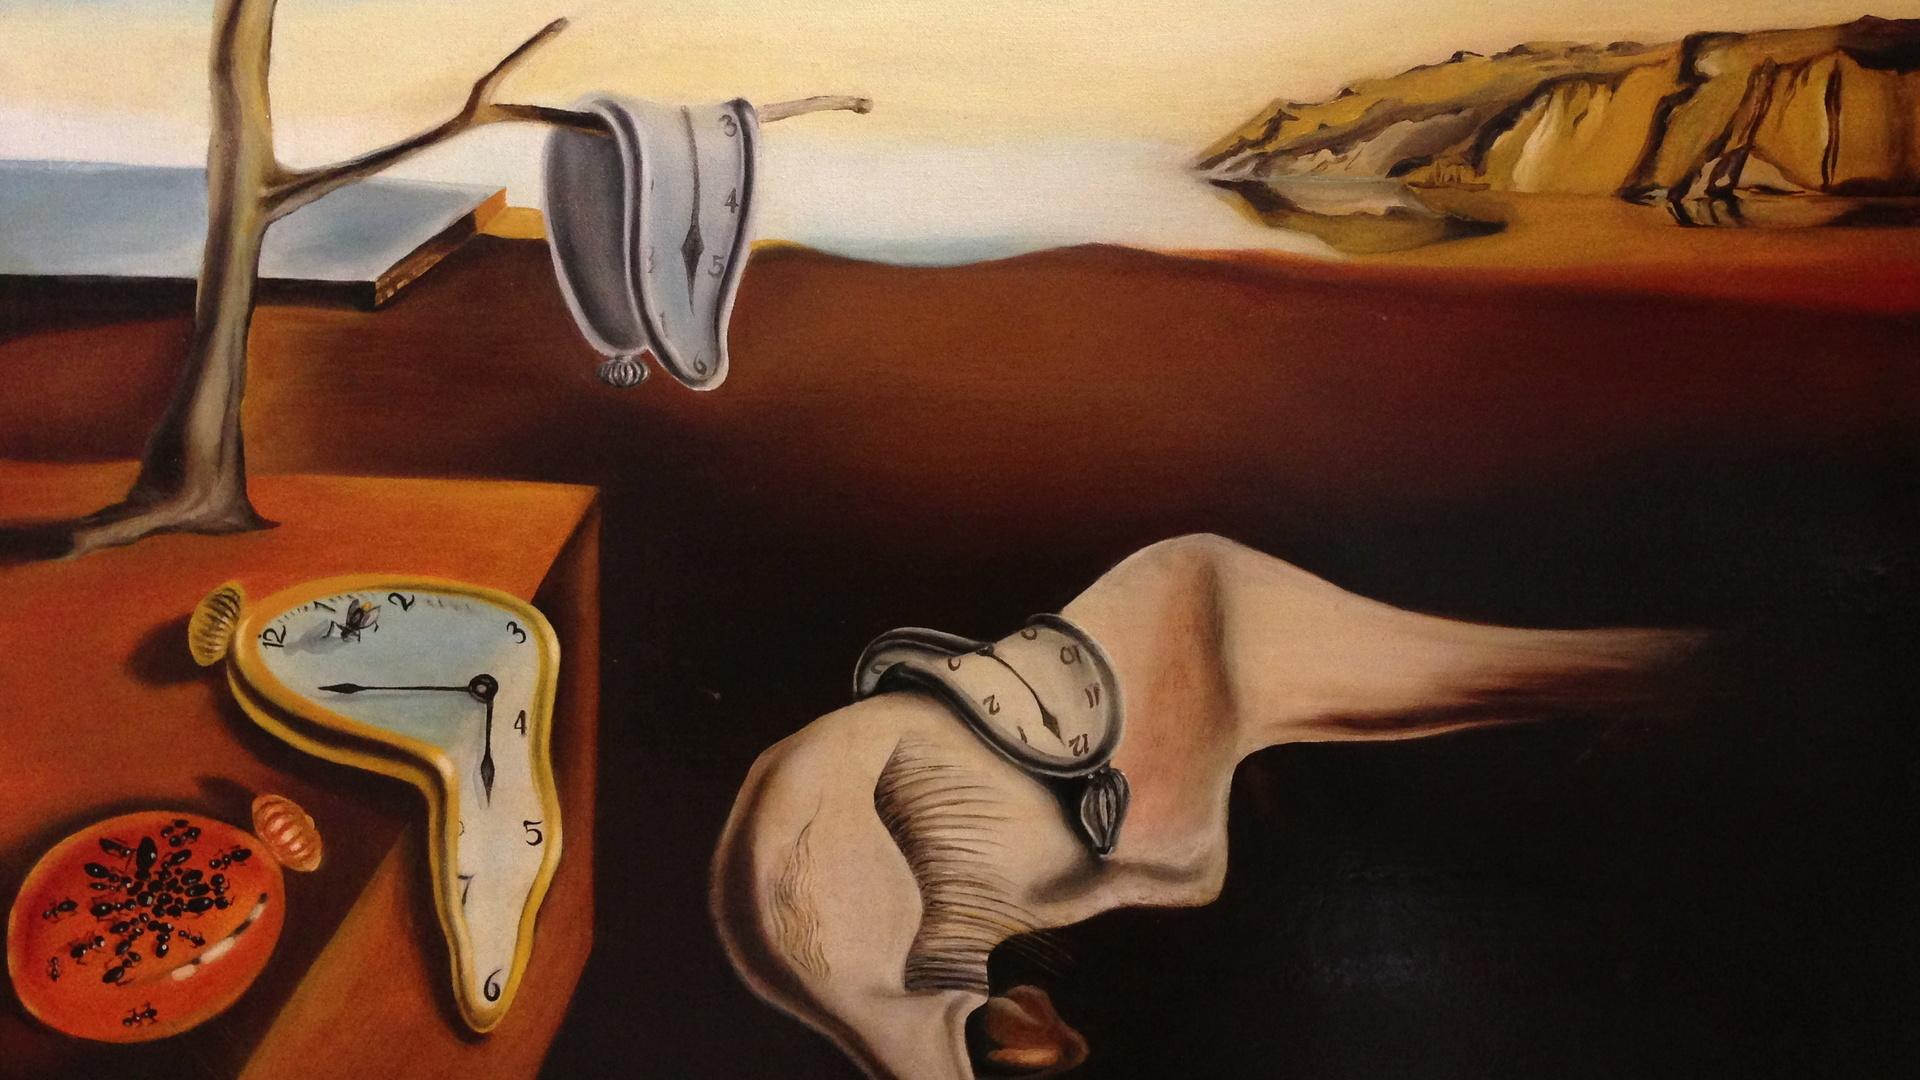 1920x1080 Arts, Salvador Dali, Paintings, Salvador Dali, 1931, The ...